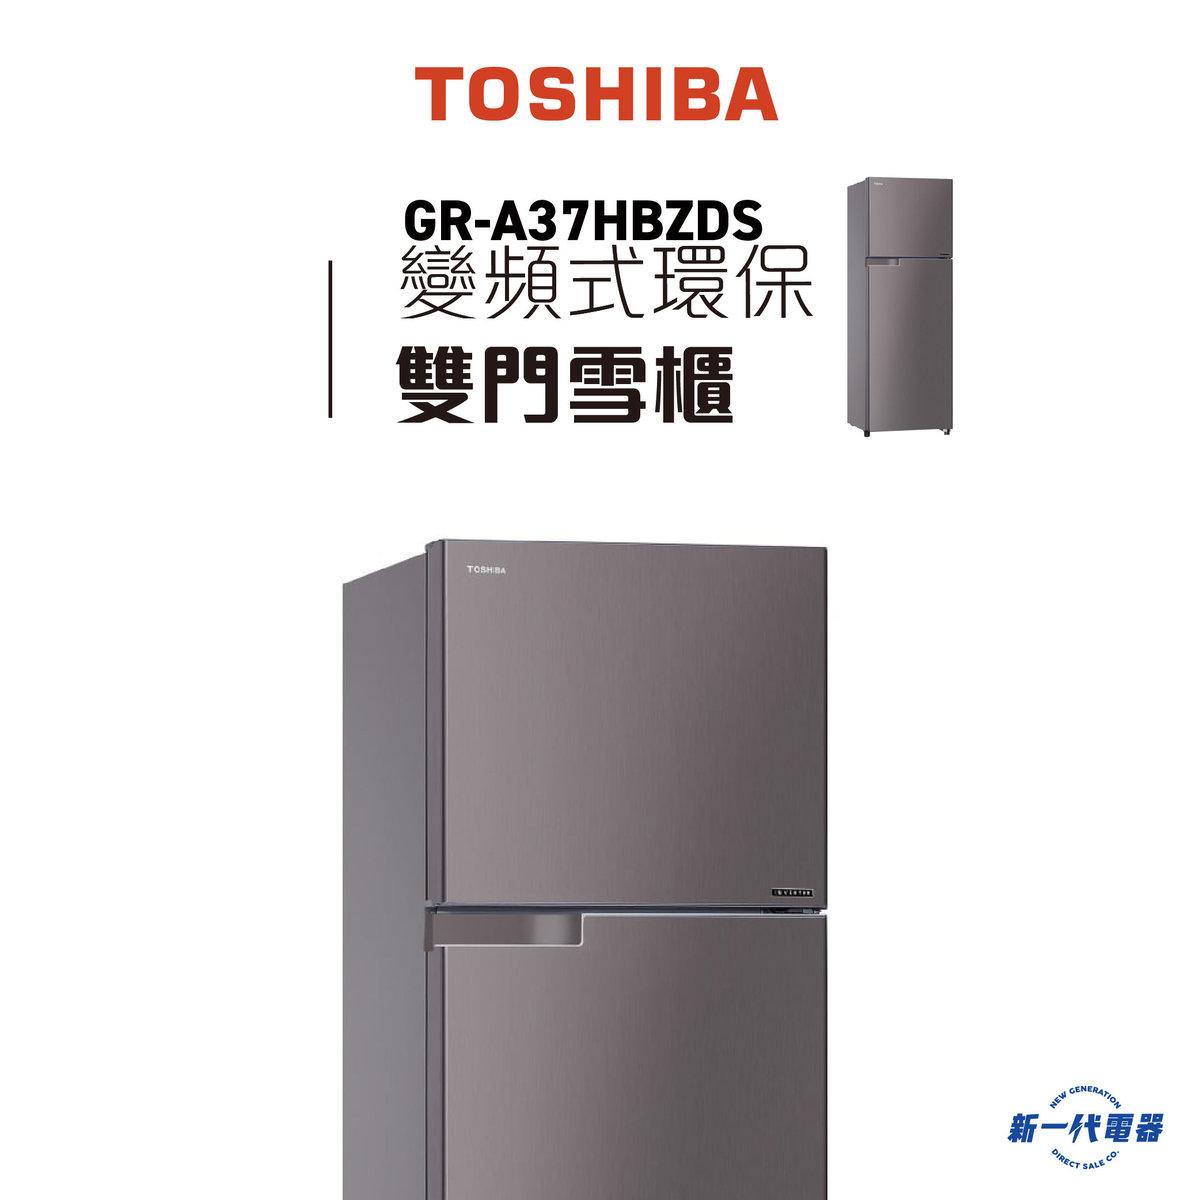 GR-A37HBZDS 2-door Inverter Compressor Refrigerator (305L)Dark Silver